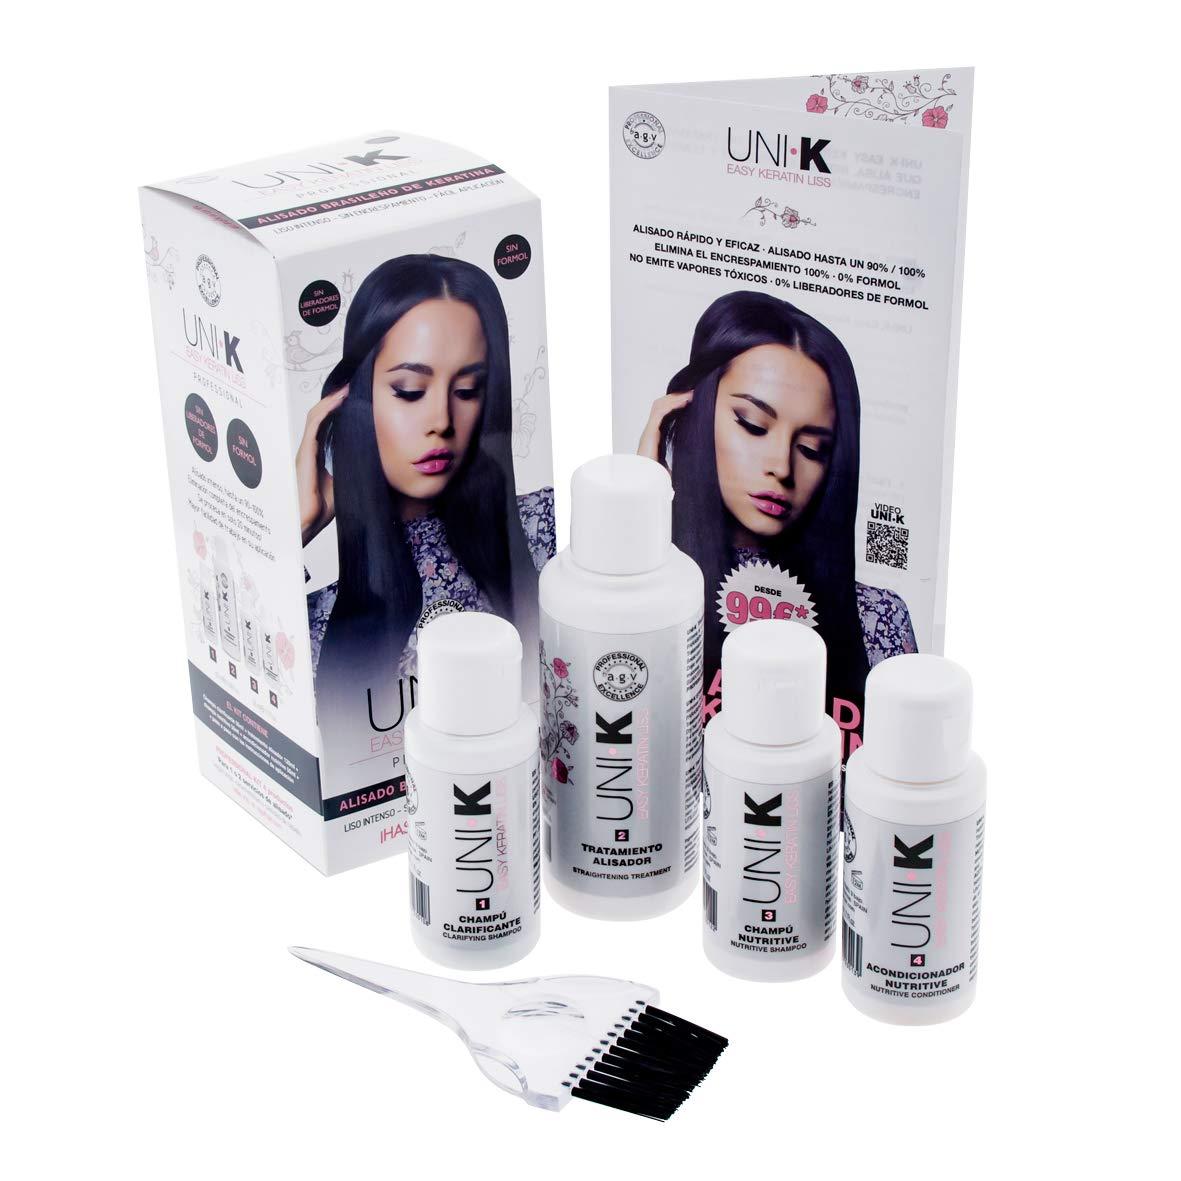 UNI.K Keratin Liss By AGV Kit - Pack Alisado Brasileño con Keratina (Queratina) Profesional sin Formol UNI K